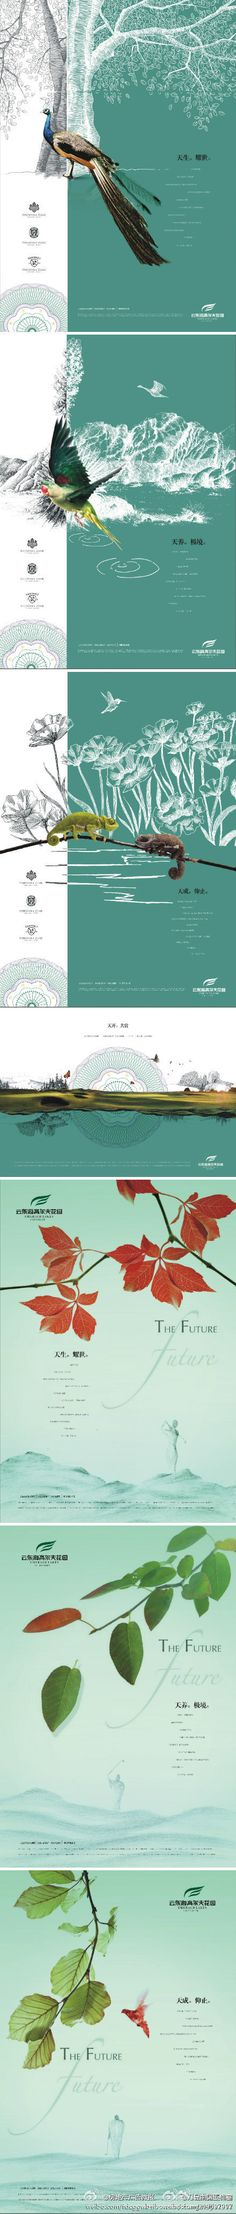 Chines layout features exquisite bird and landscape illustrations Print Layout, Layout Design, Graphic Design Posters, Typography Design, Book Design, Design Art, Print Design, Photoshop, Brochure Design